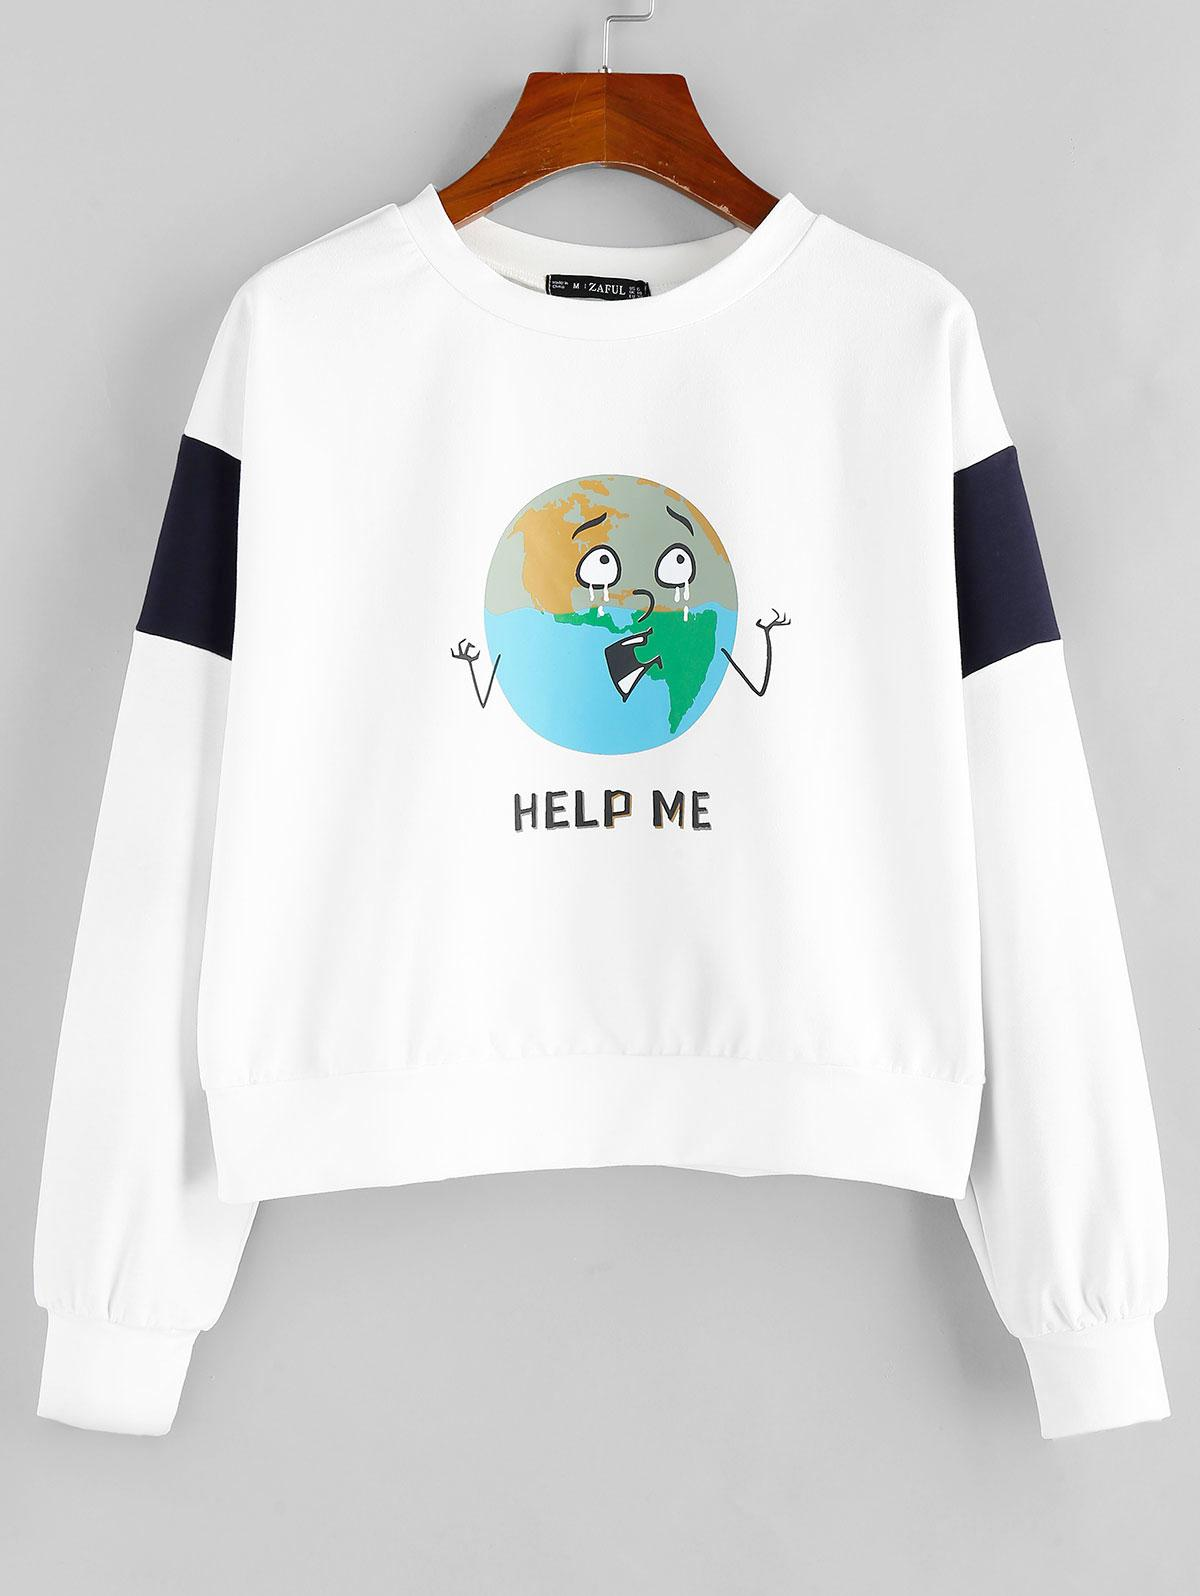 ZAFUL HELP ME Graphic Sweatshirt фото